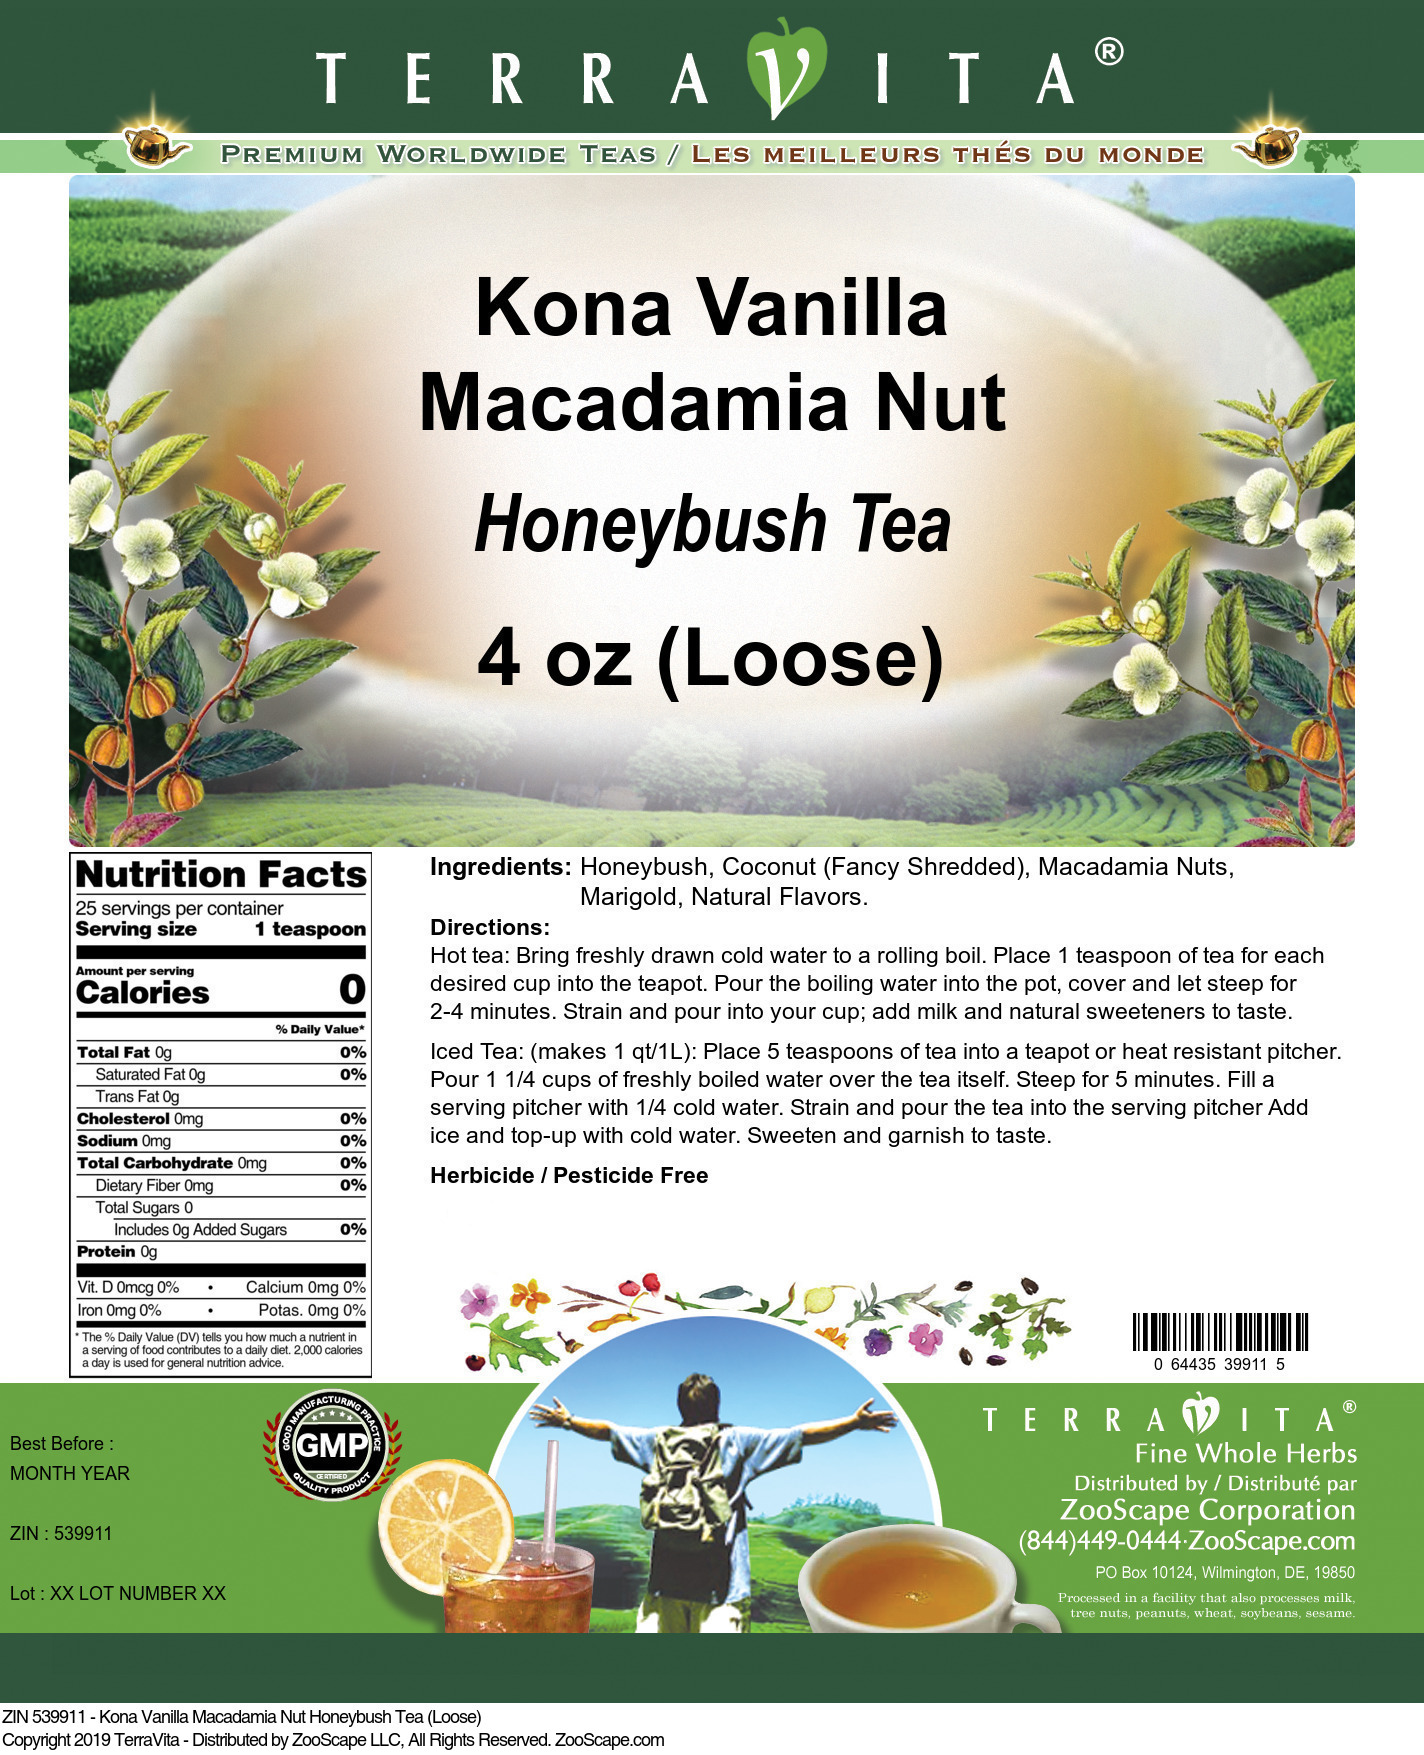 Kona Vanilla Macadamia Nut Honeybush Tea (Loose)